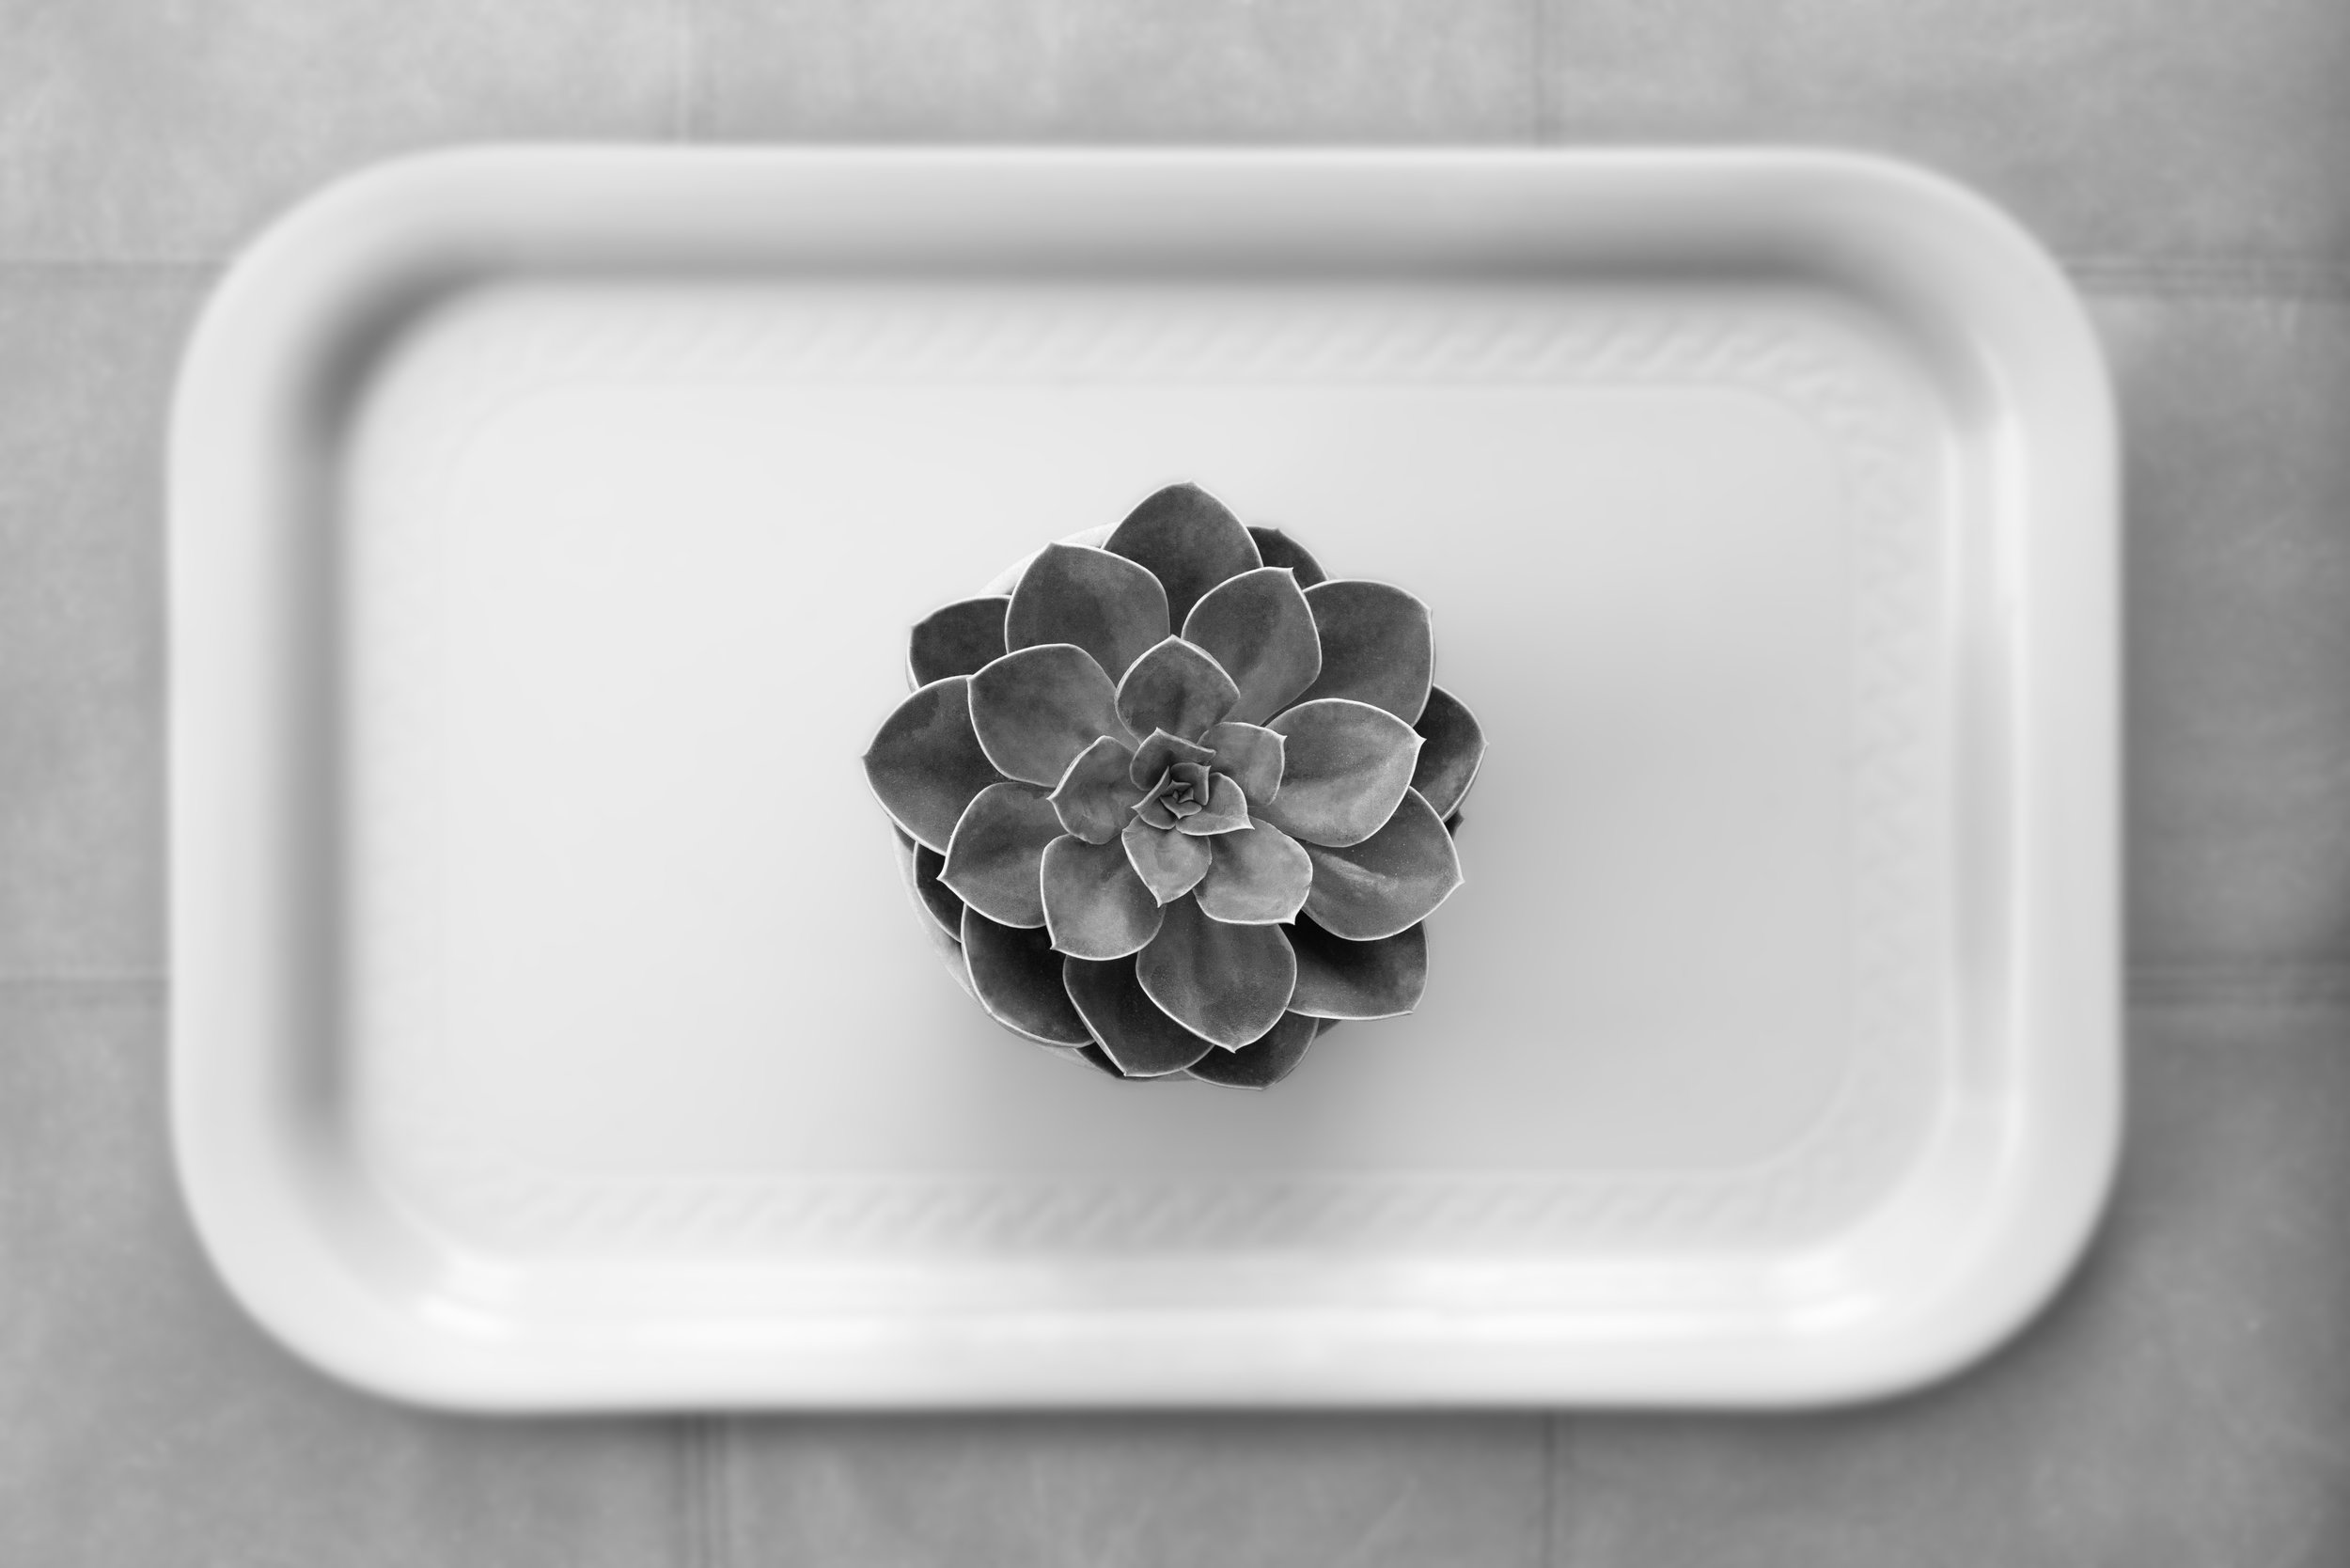 Plant_on_tray.jpg